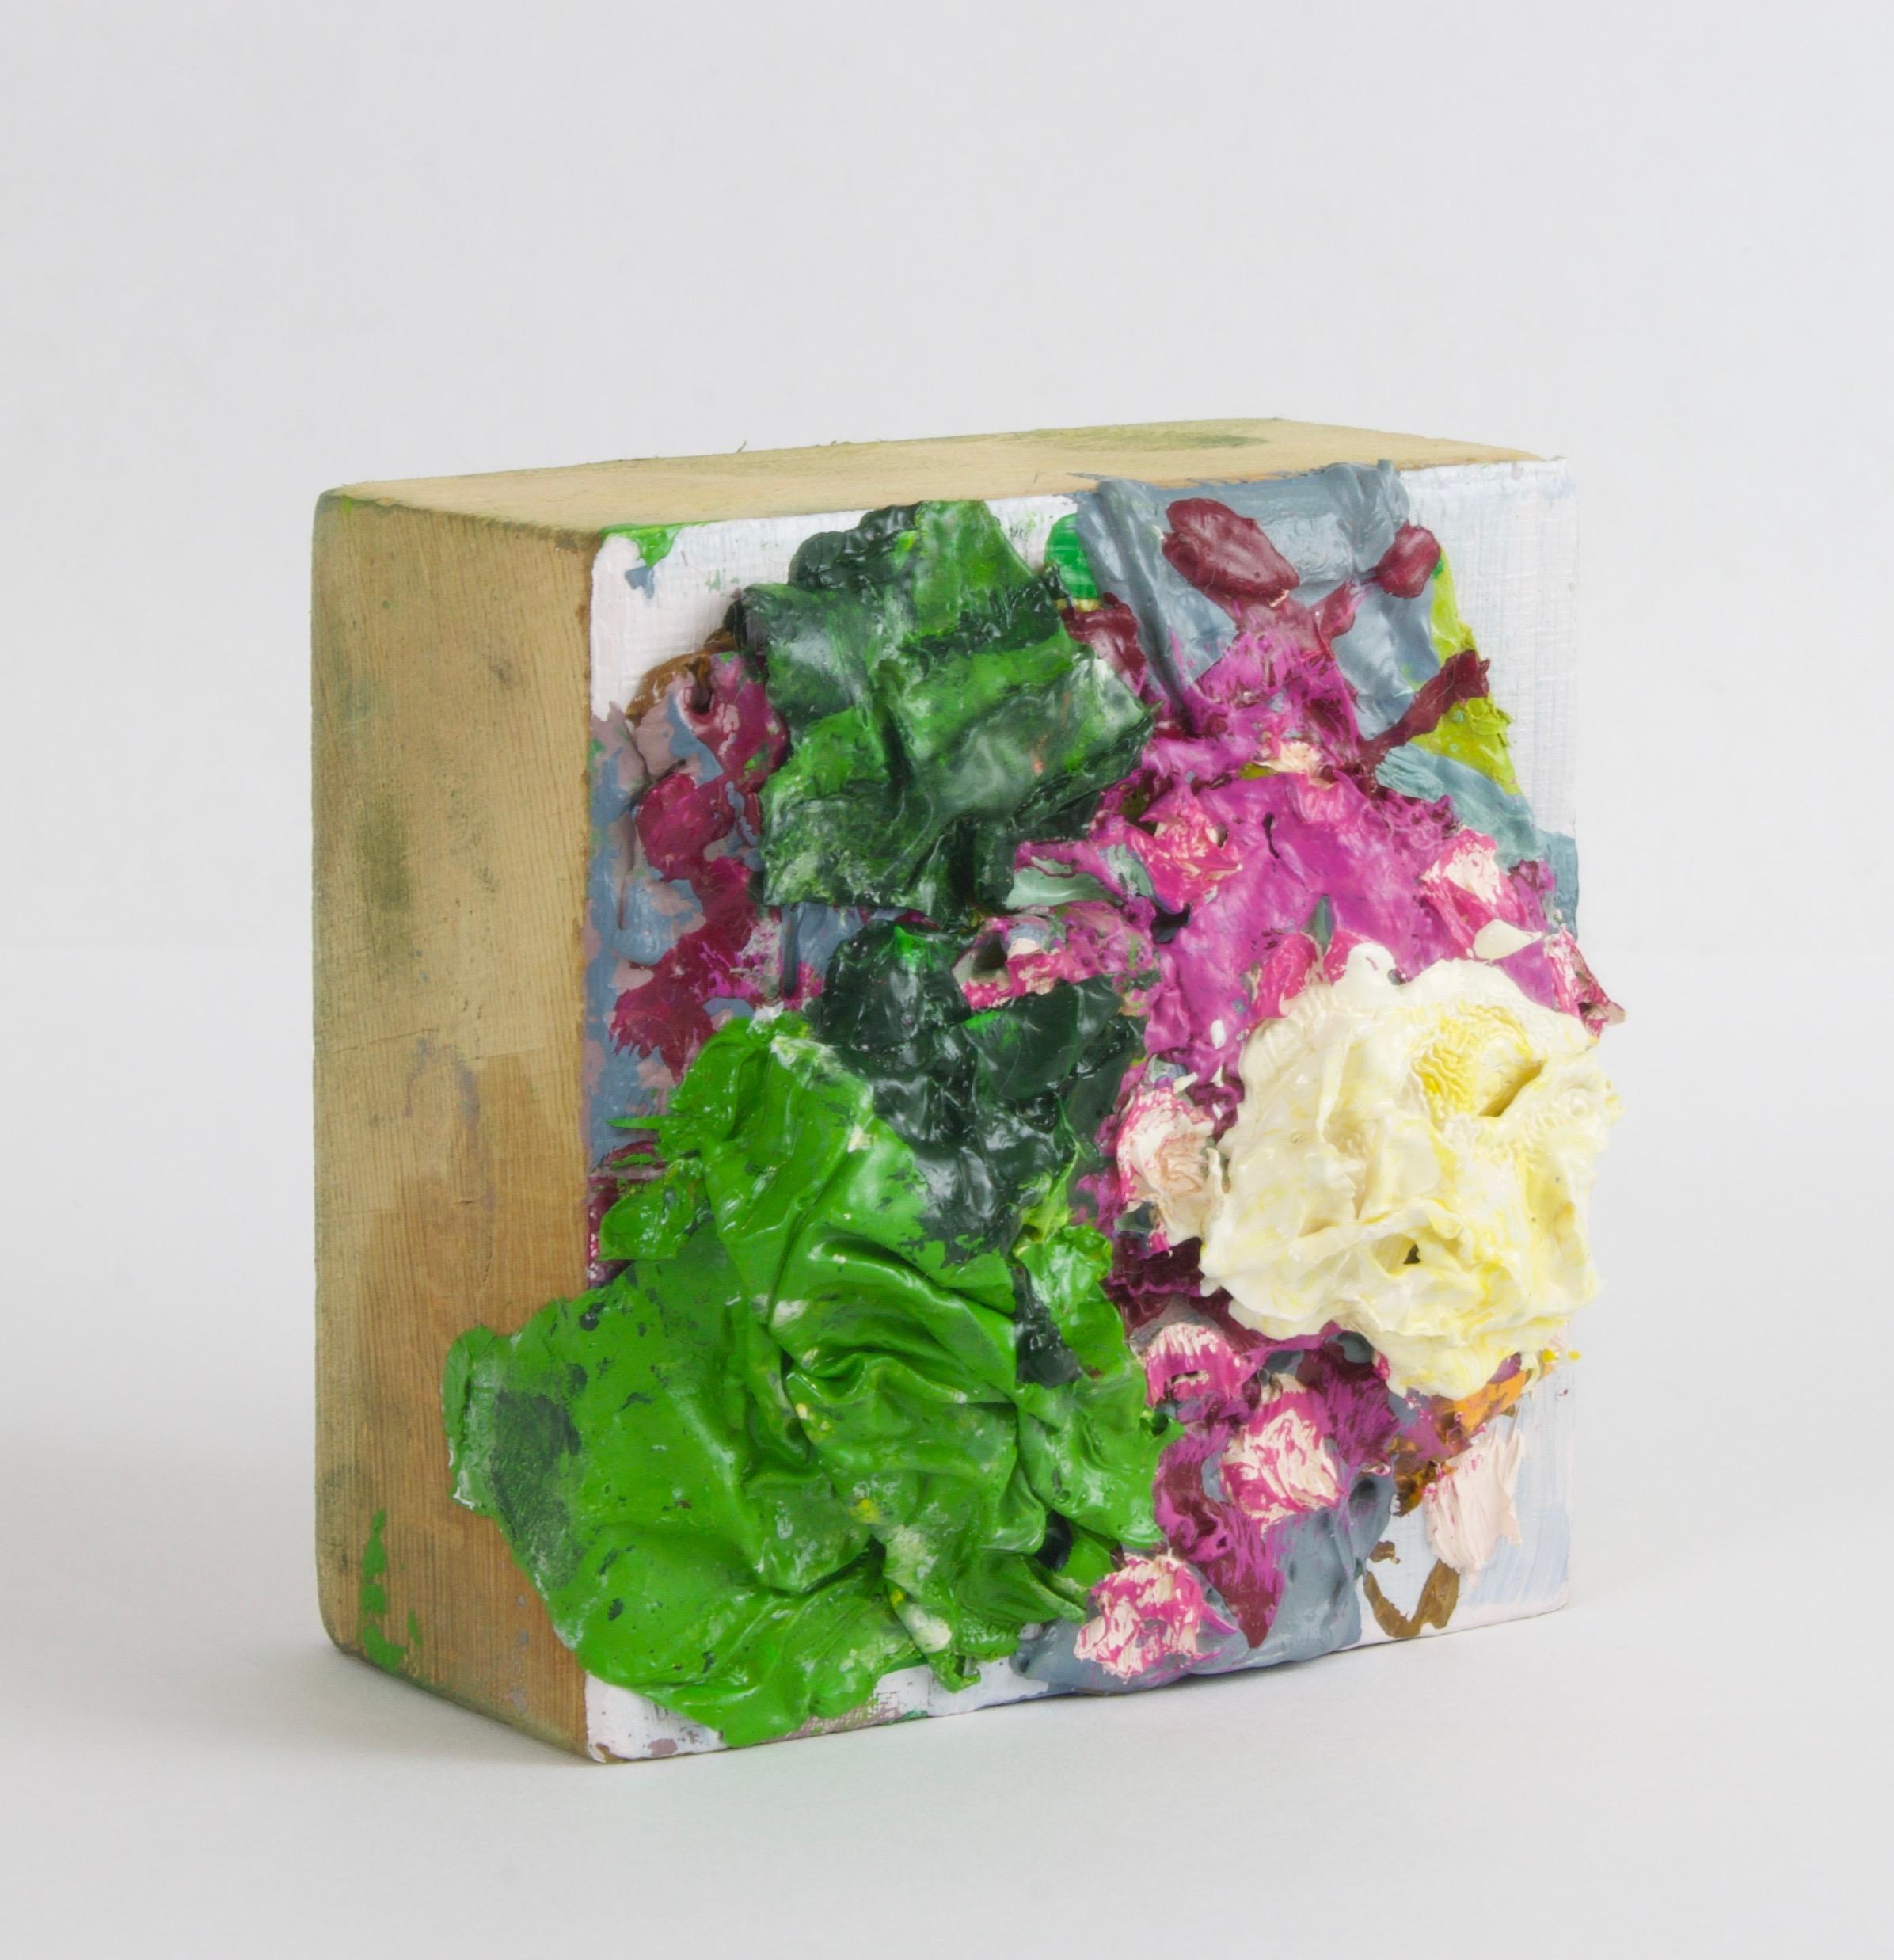 Untitled (Flourish with Trellis)